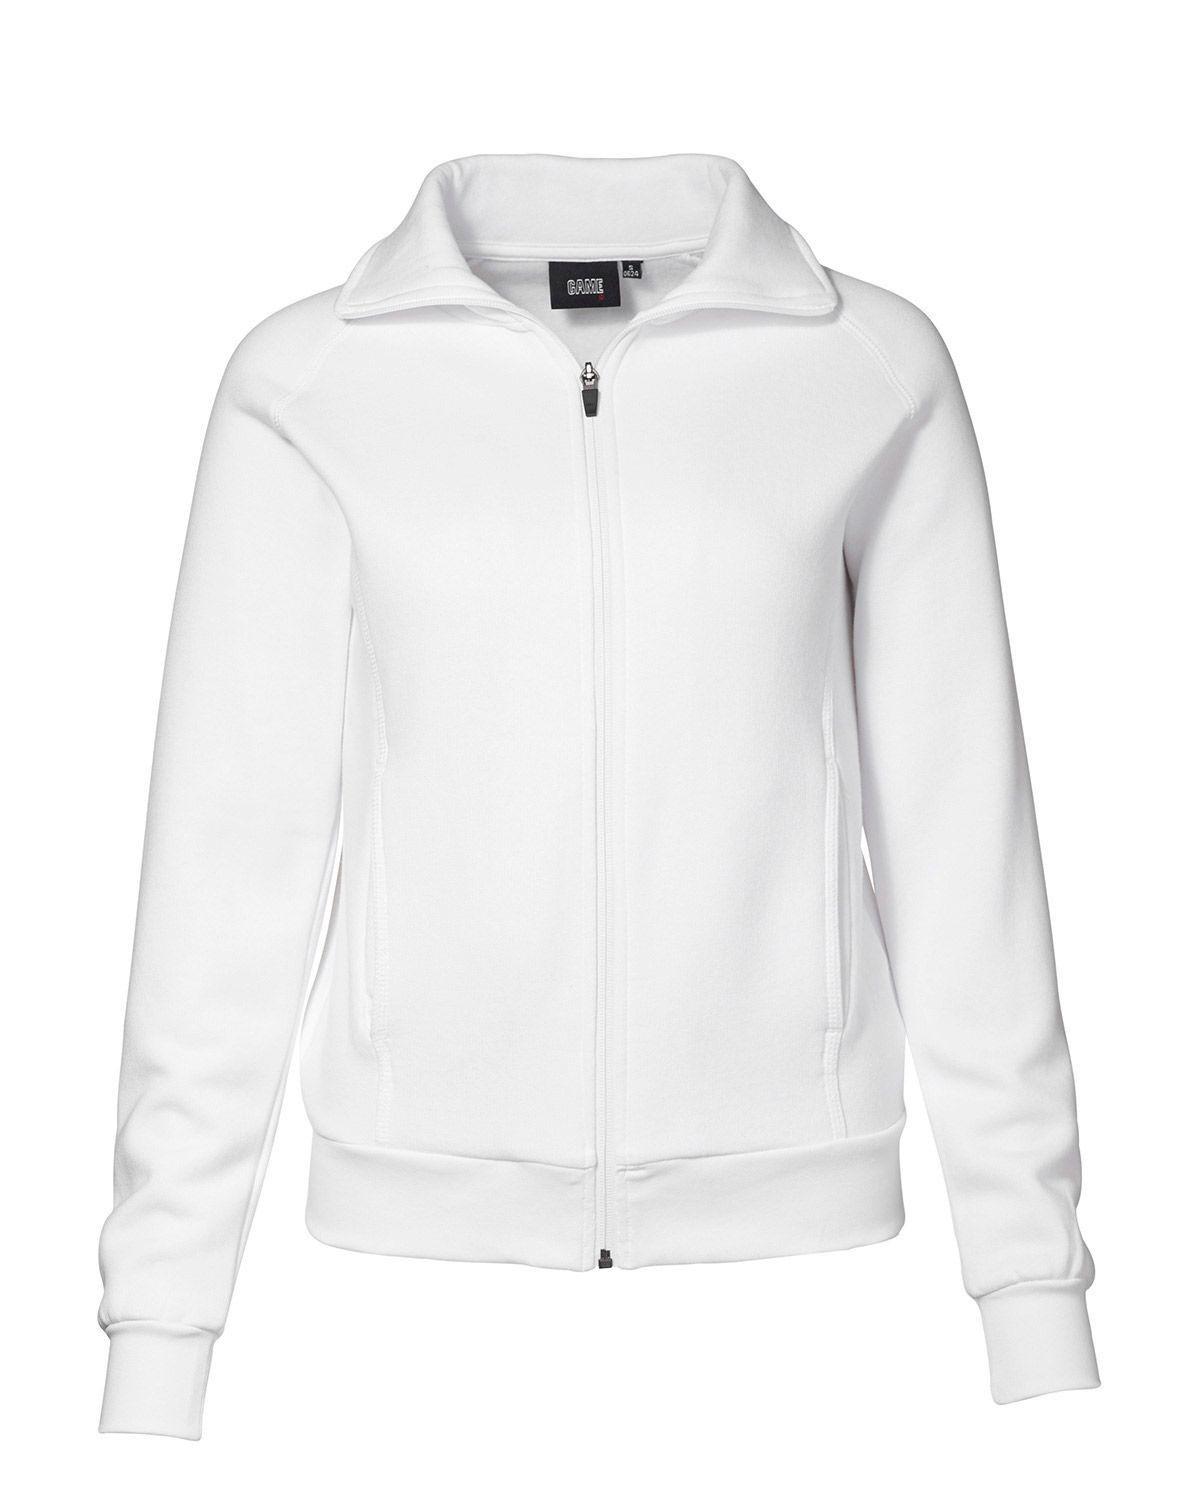 ID Cardigan Sweatshirt för Kvinnor (Vit, XS)